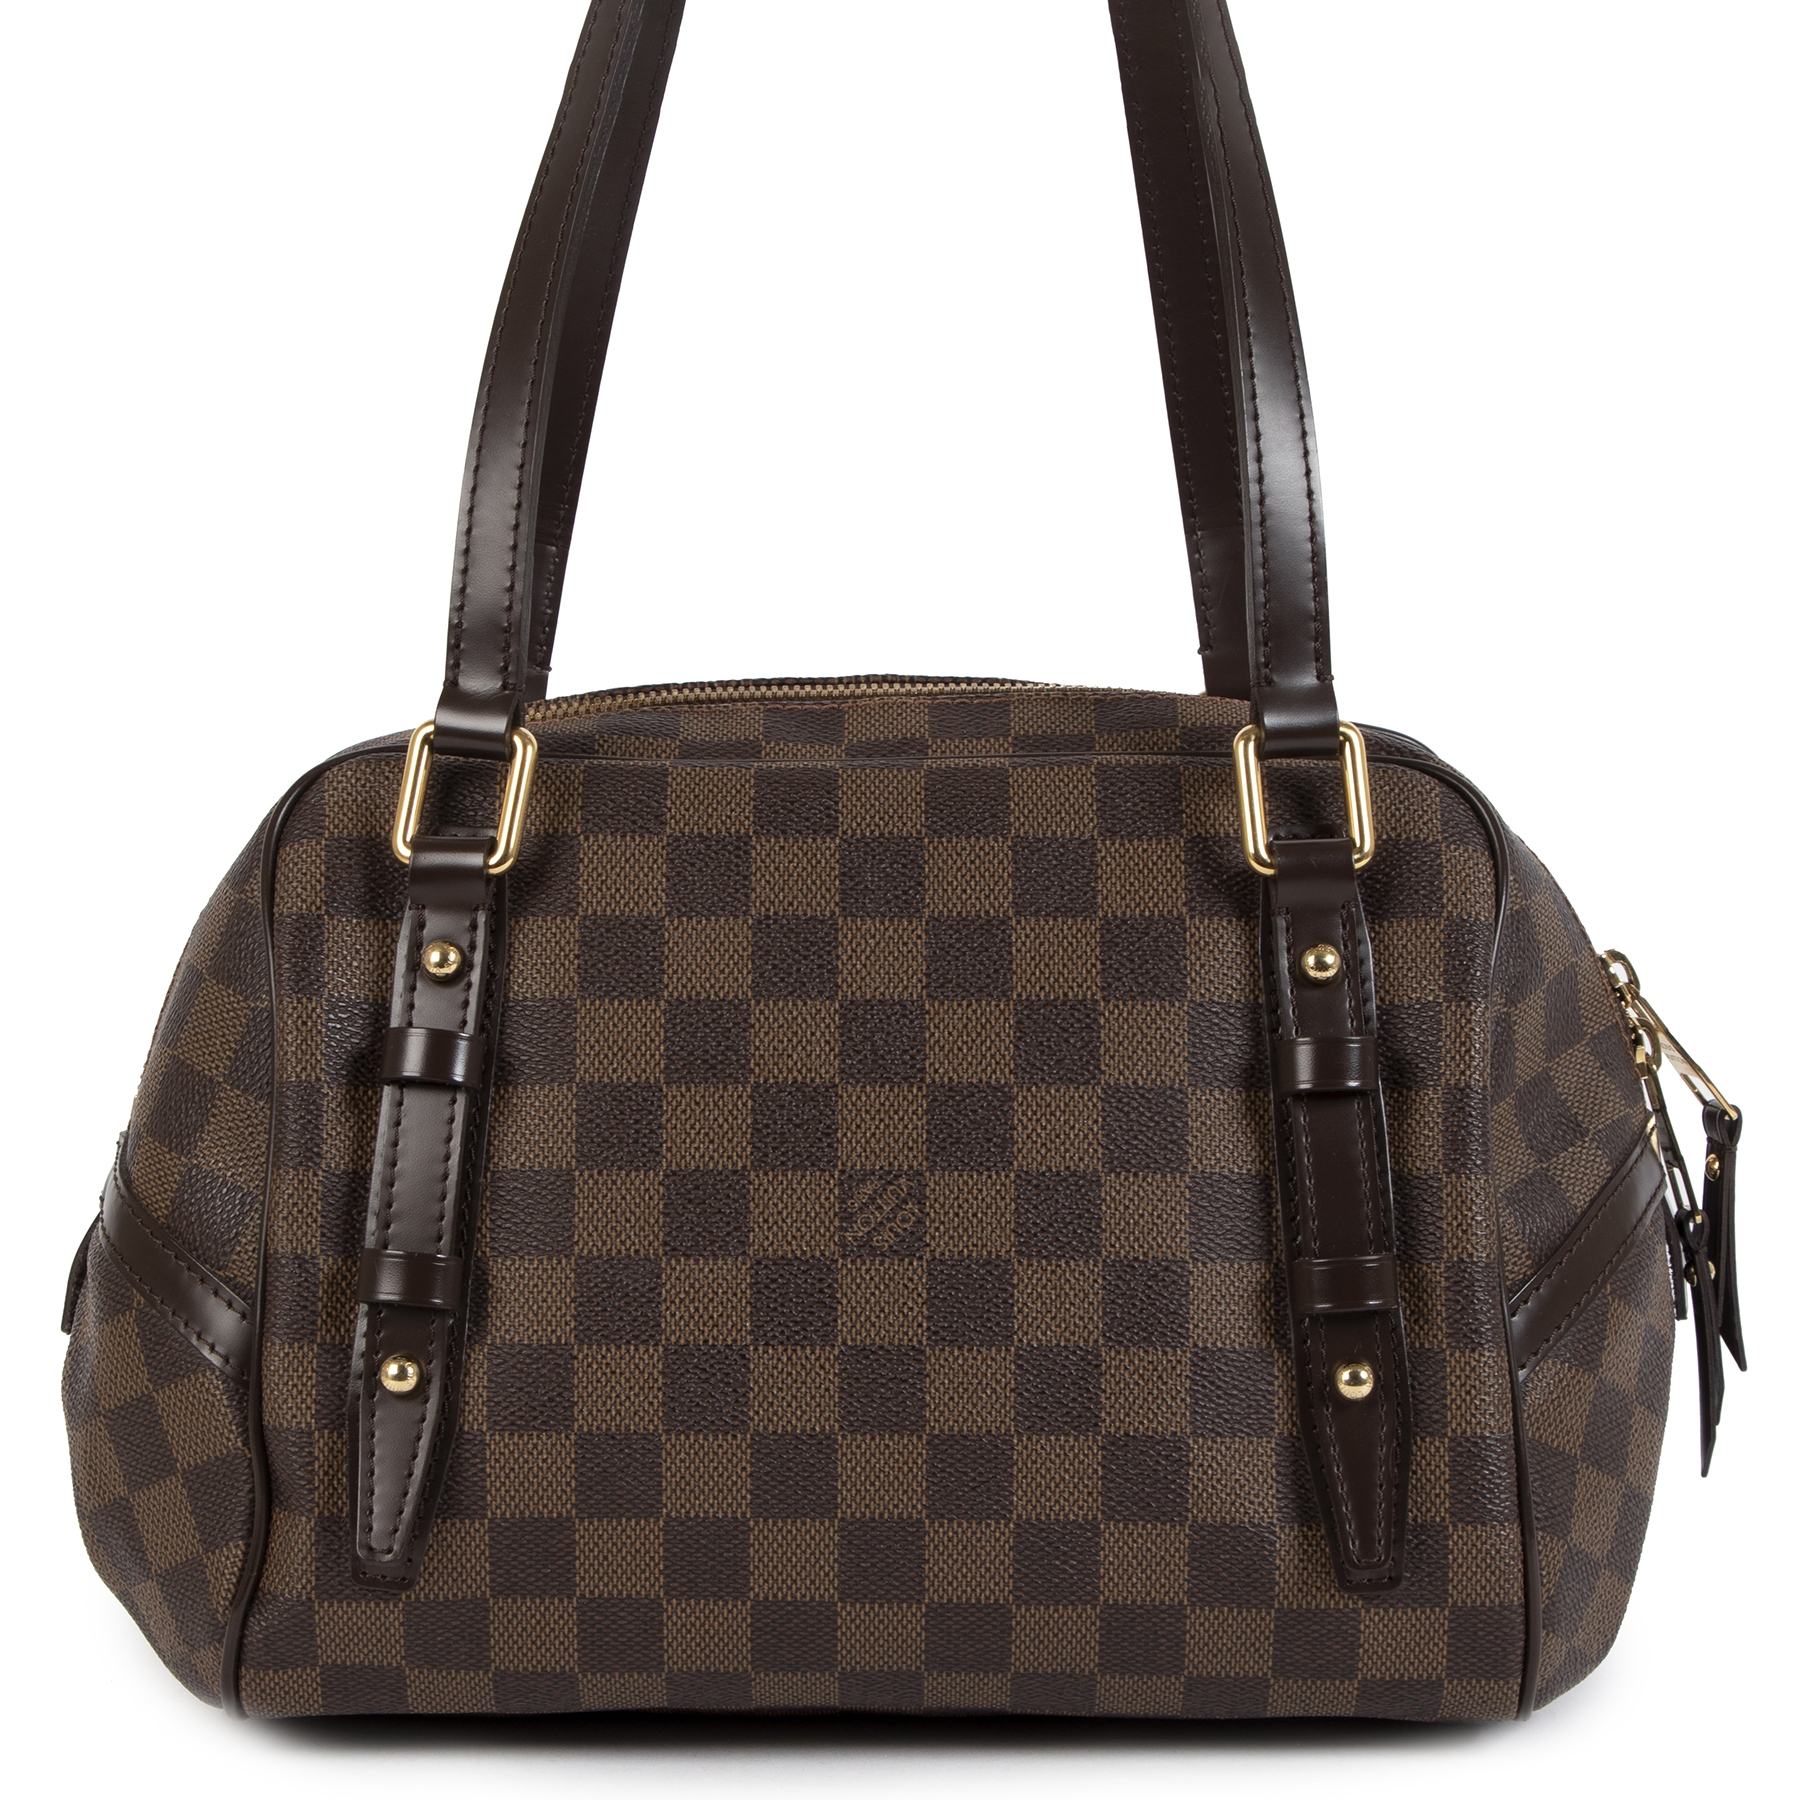 Authentic secondhand Louis Vuitton Damier Rivington PM Bag designer bags accessories pumps luxury designer vintage webshop safe secure online shopping fashion fashionista worldwide shipping